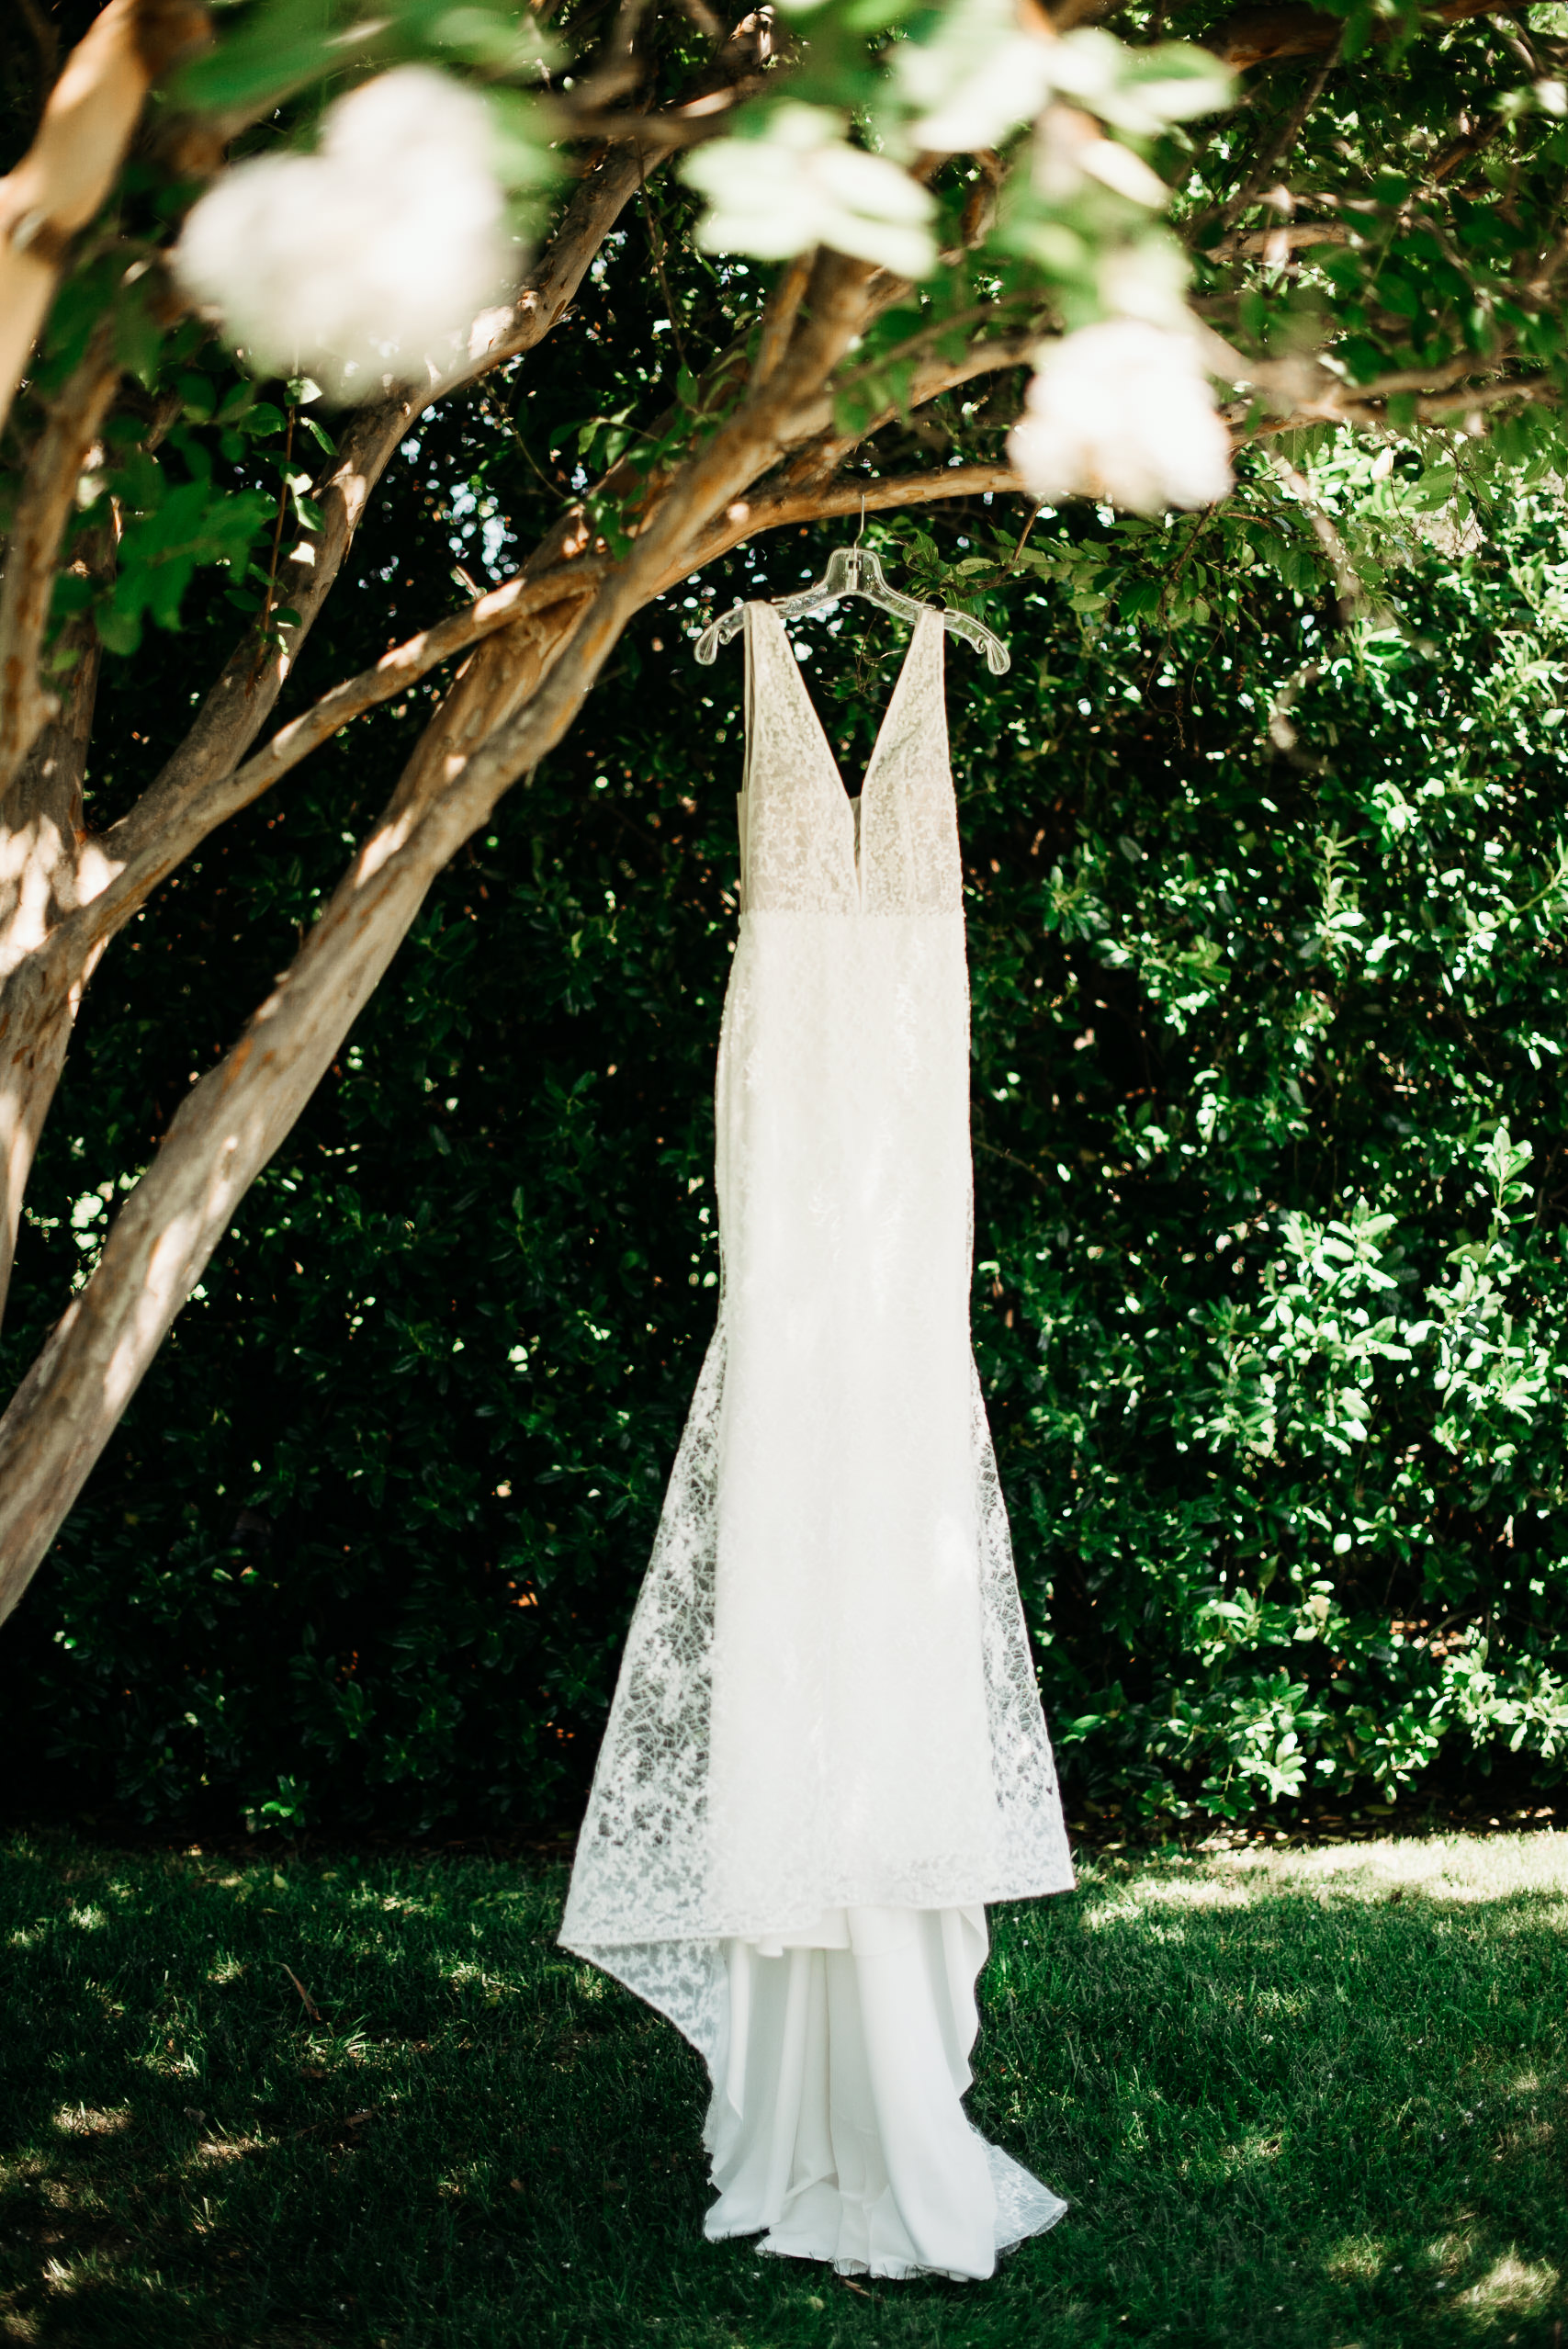 okc-wedding-photographer-coles-garden-wedding-okc-best-wedding-photographers-6.jpg